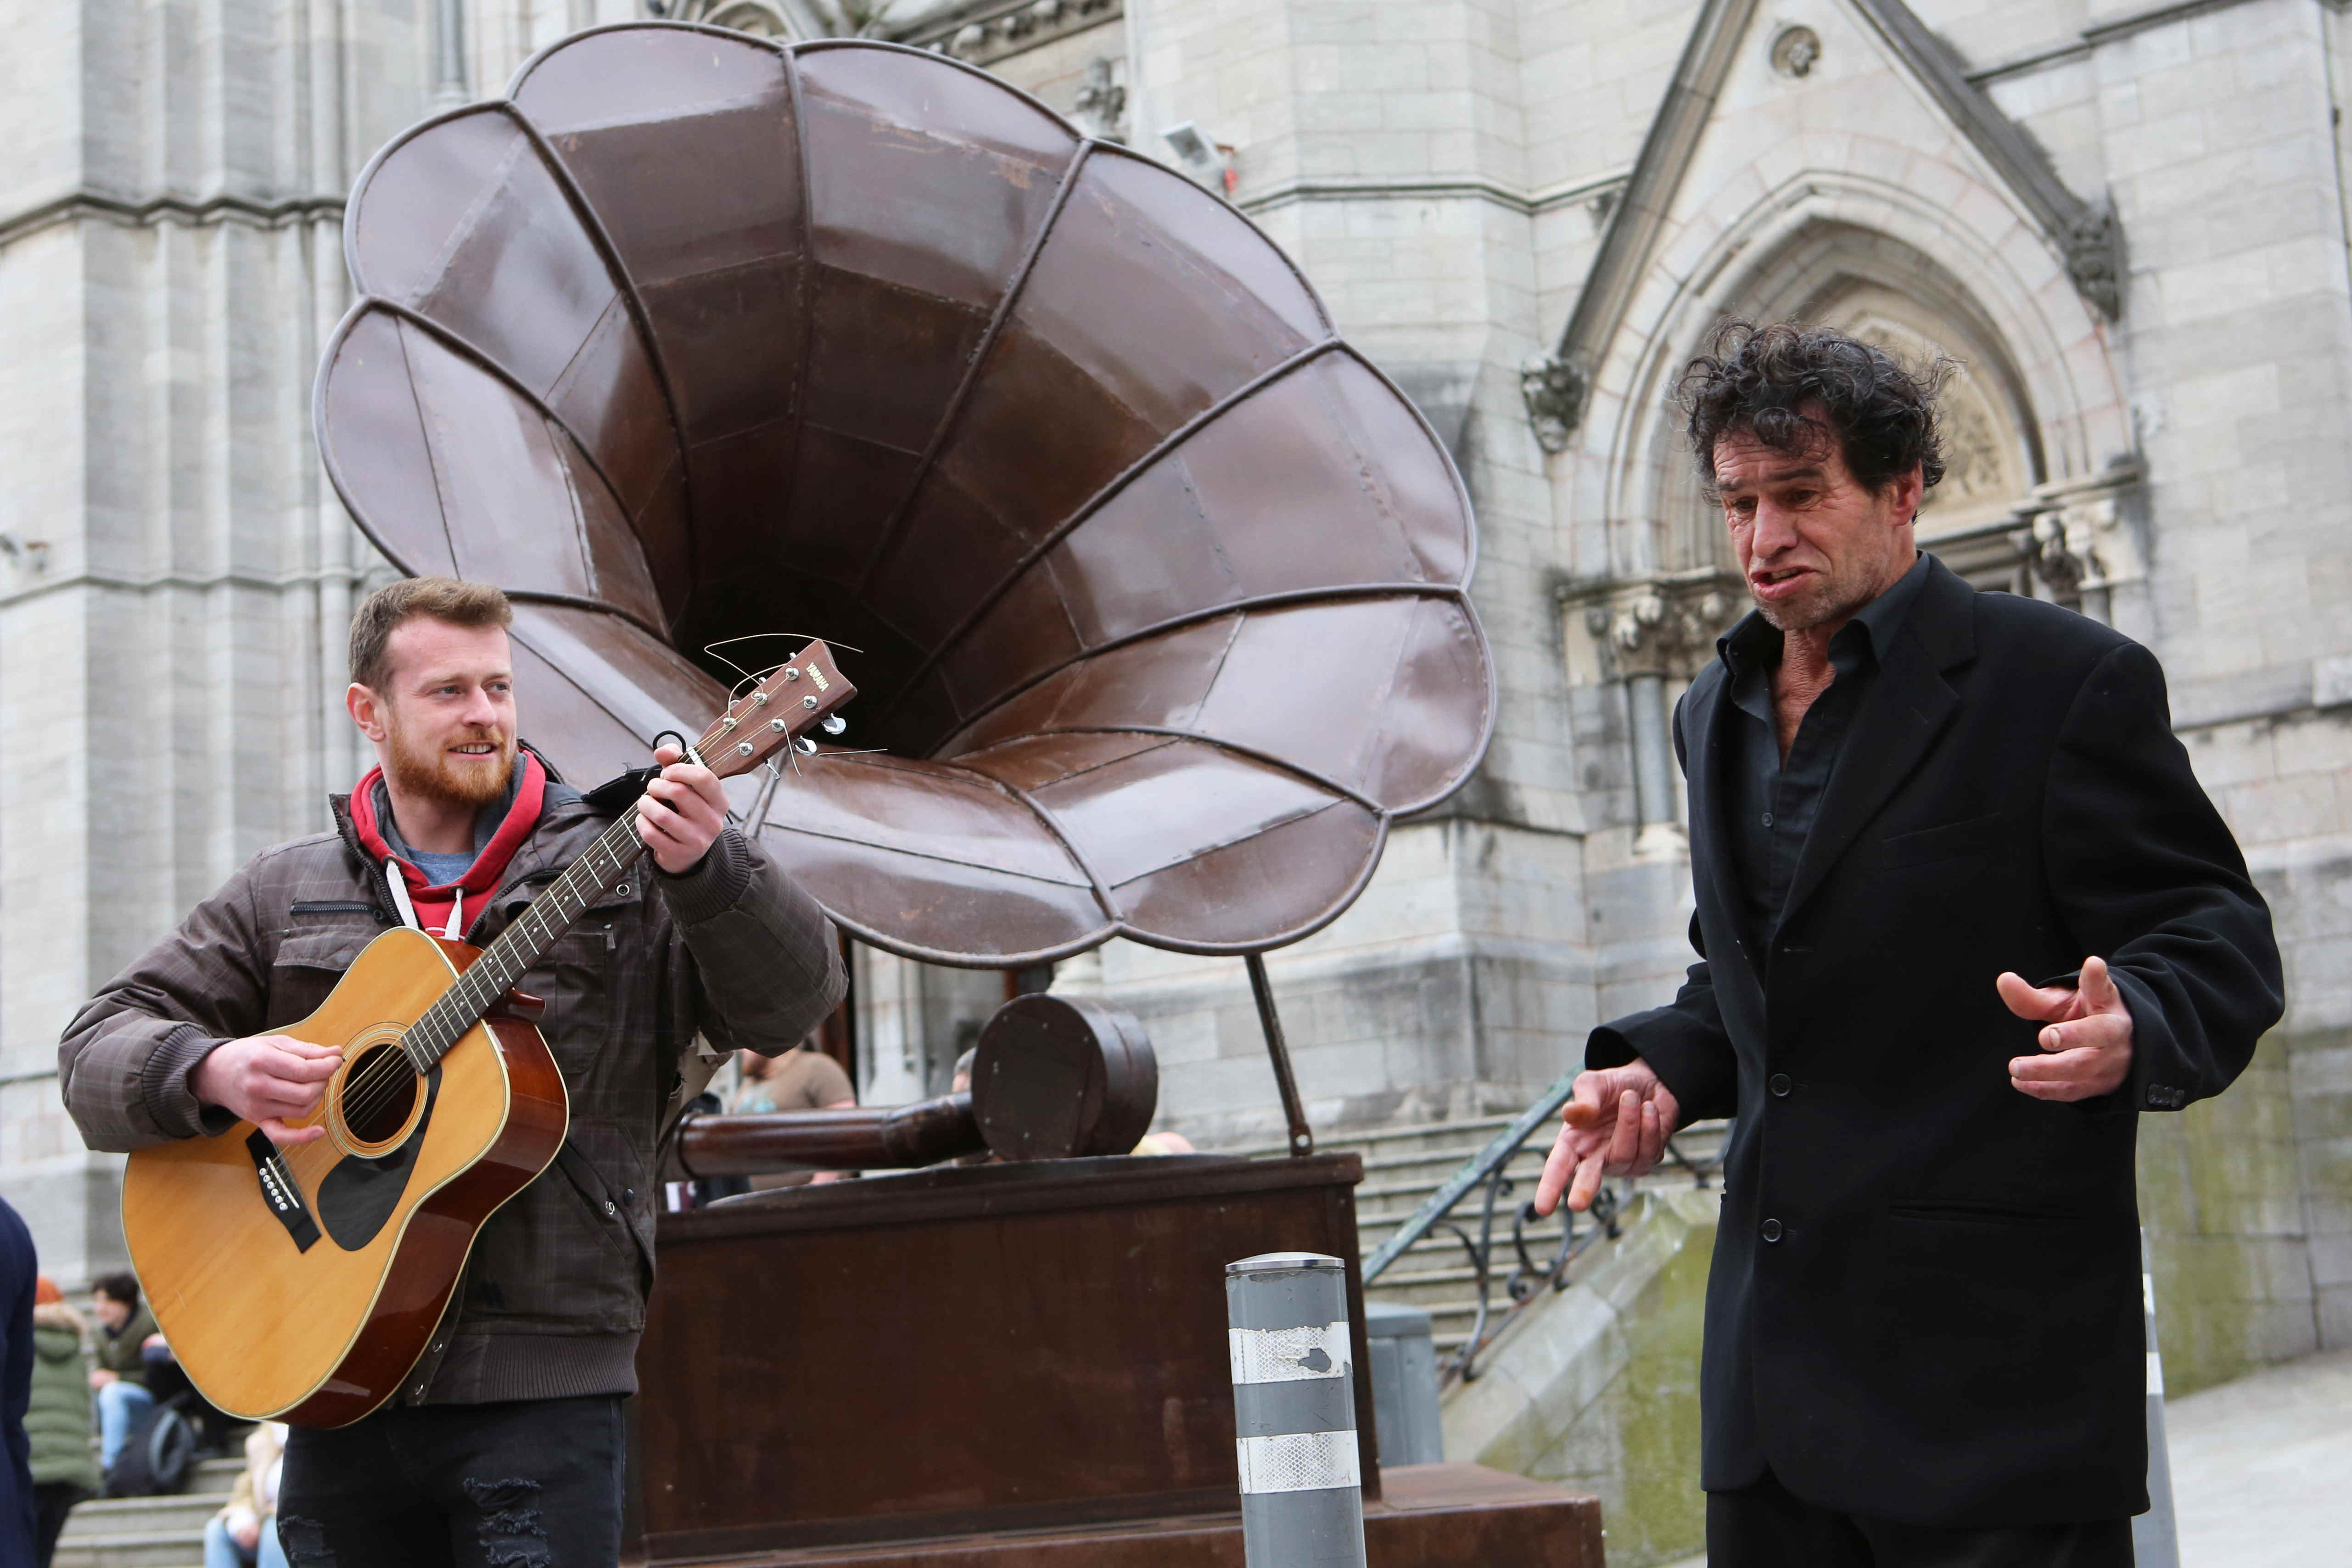 Drogheda Arts Festival 2017, Jenny Callanan Photography, Drogheda, Co.Louth